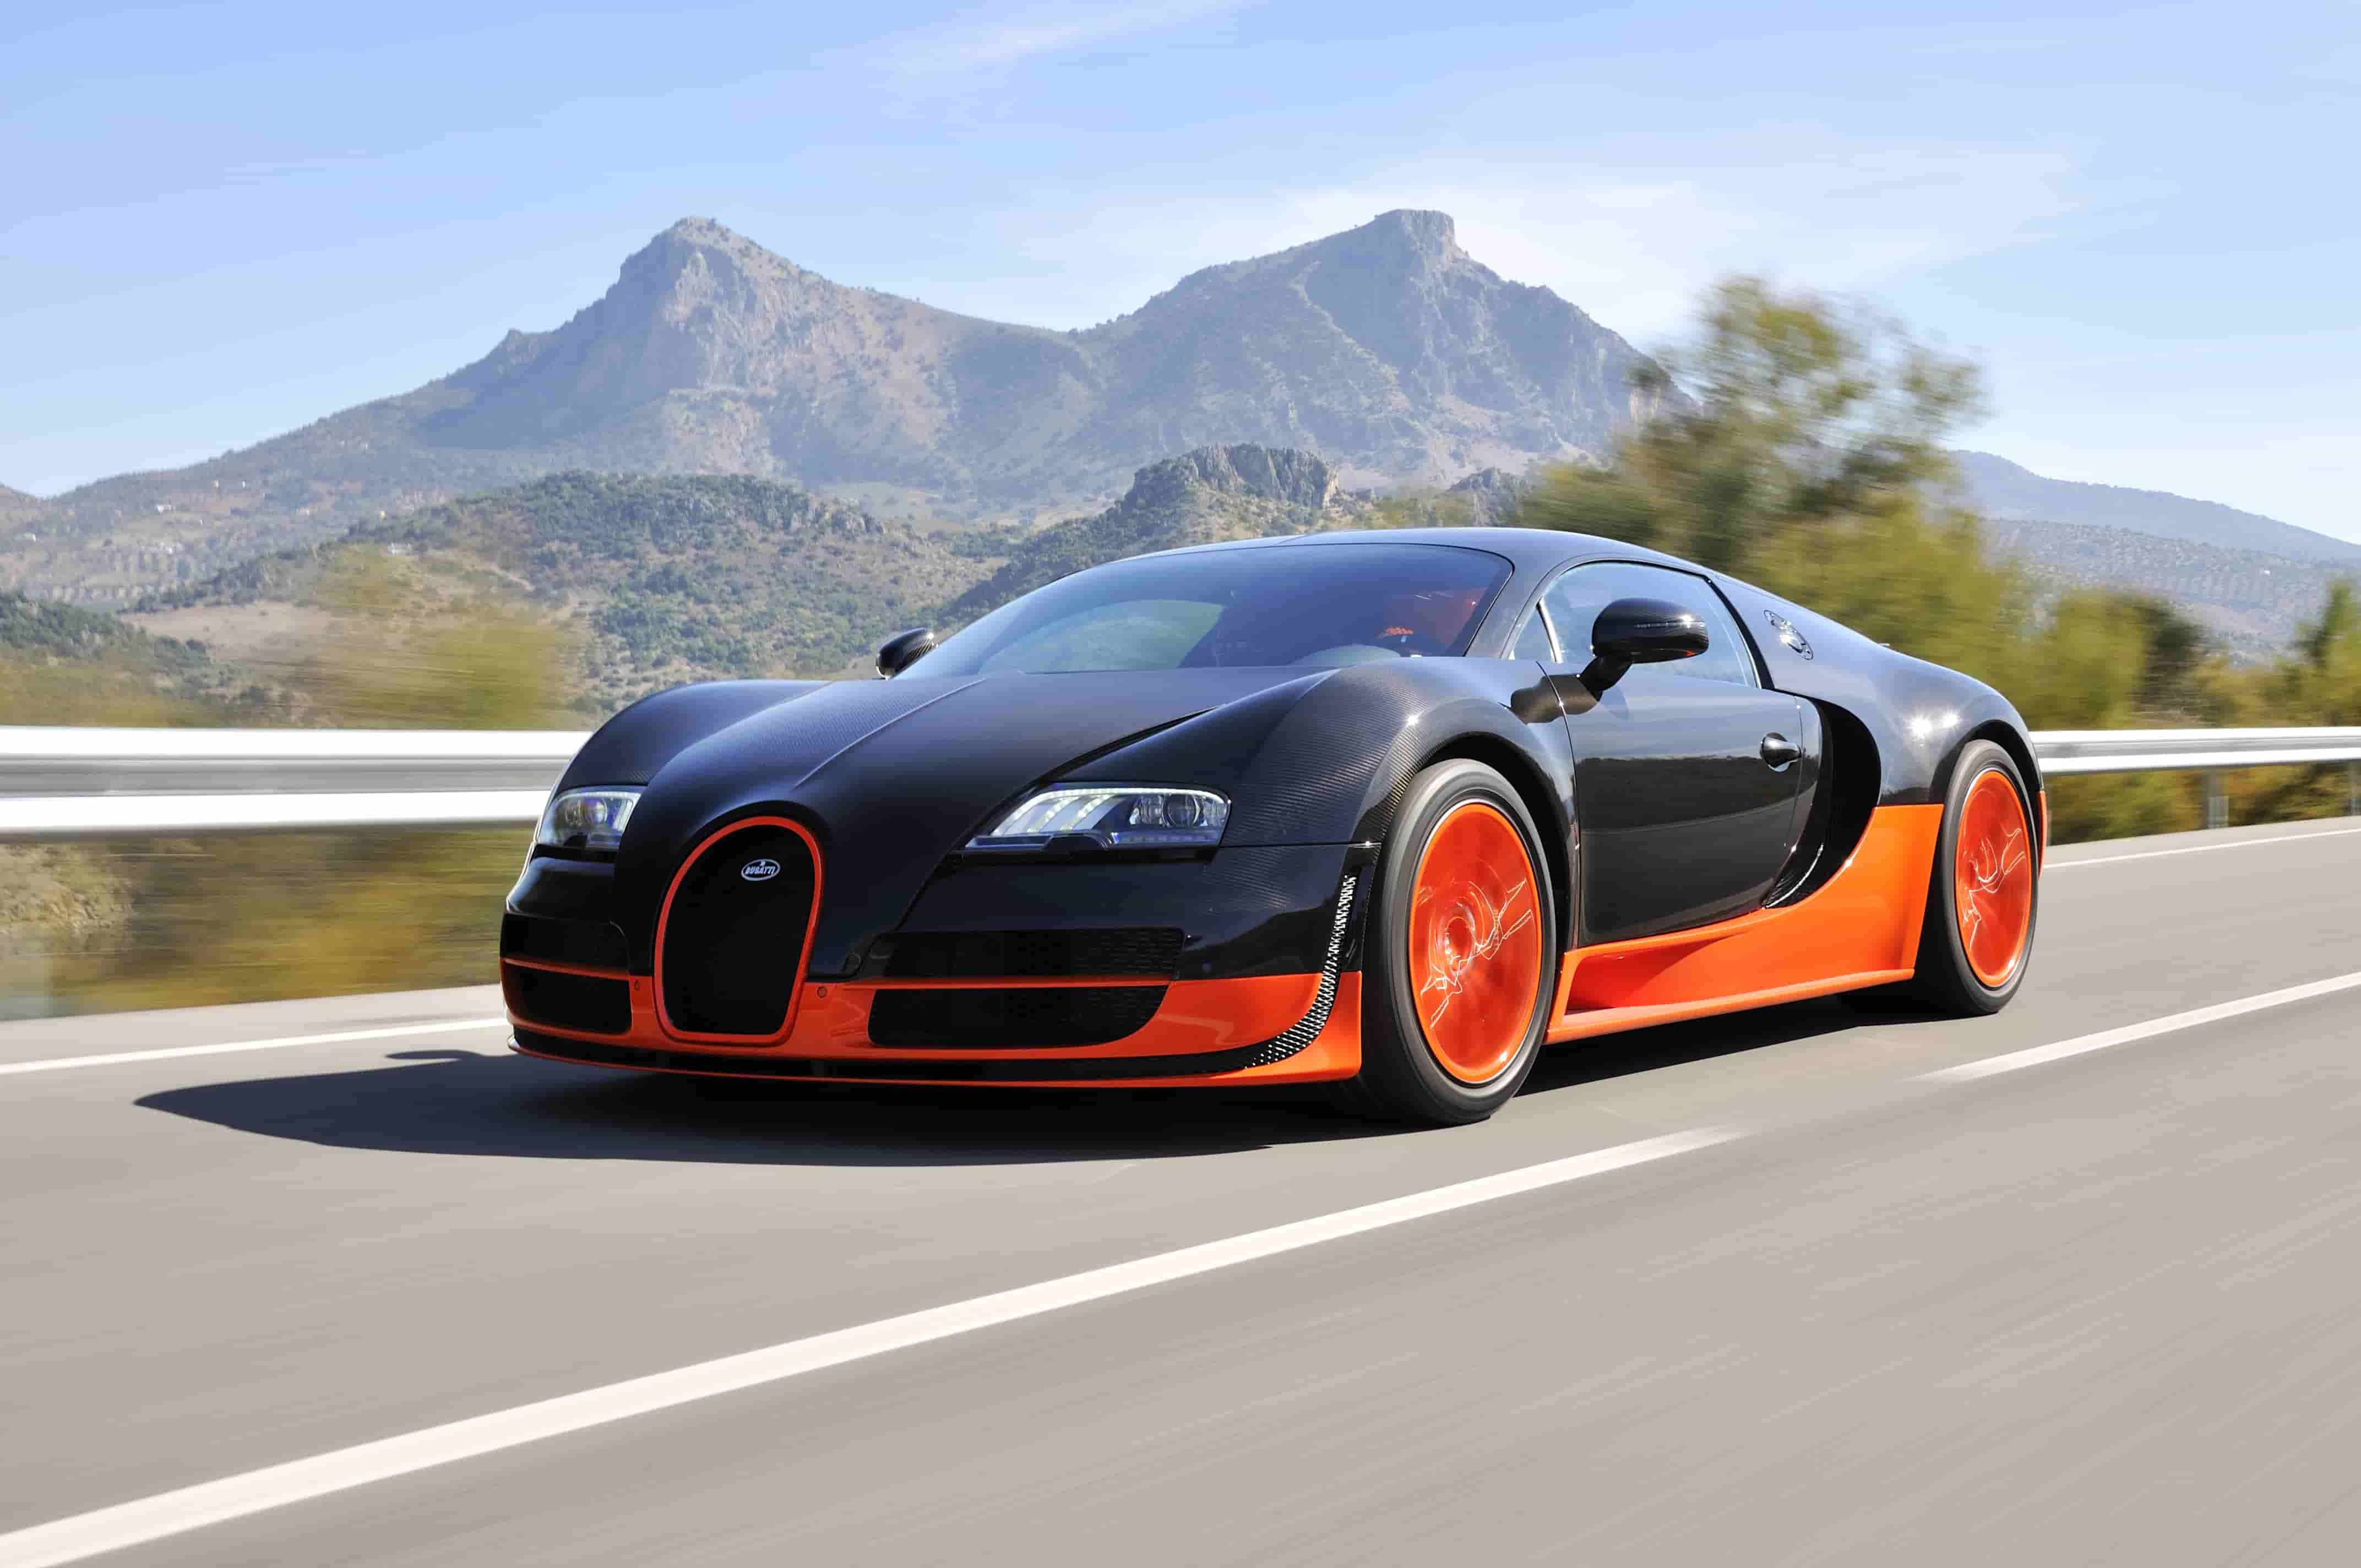 Bugatti Veyron roule à grande vitesse